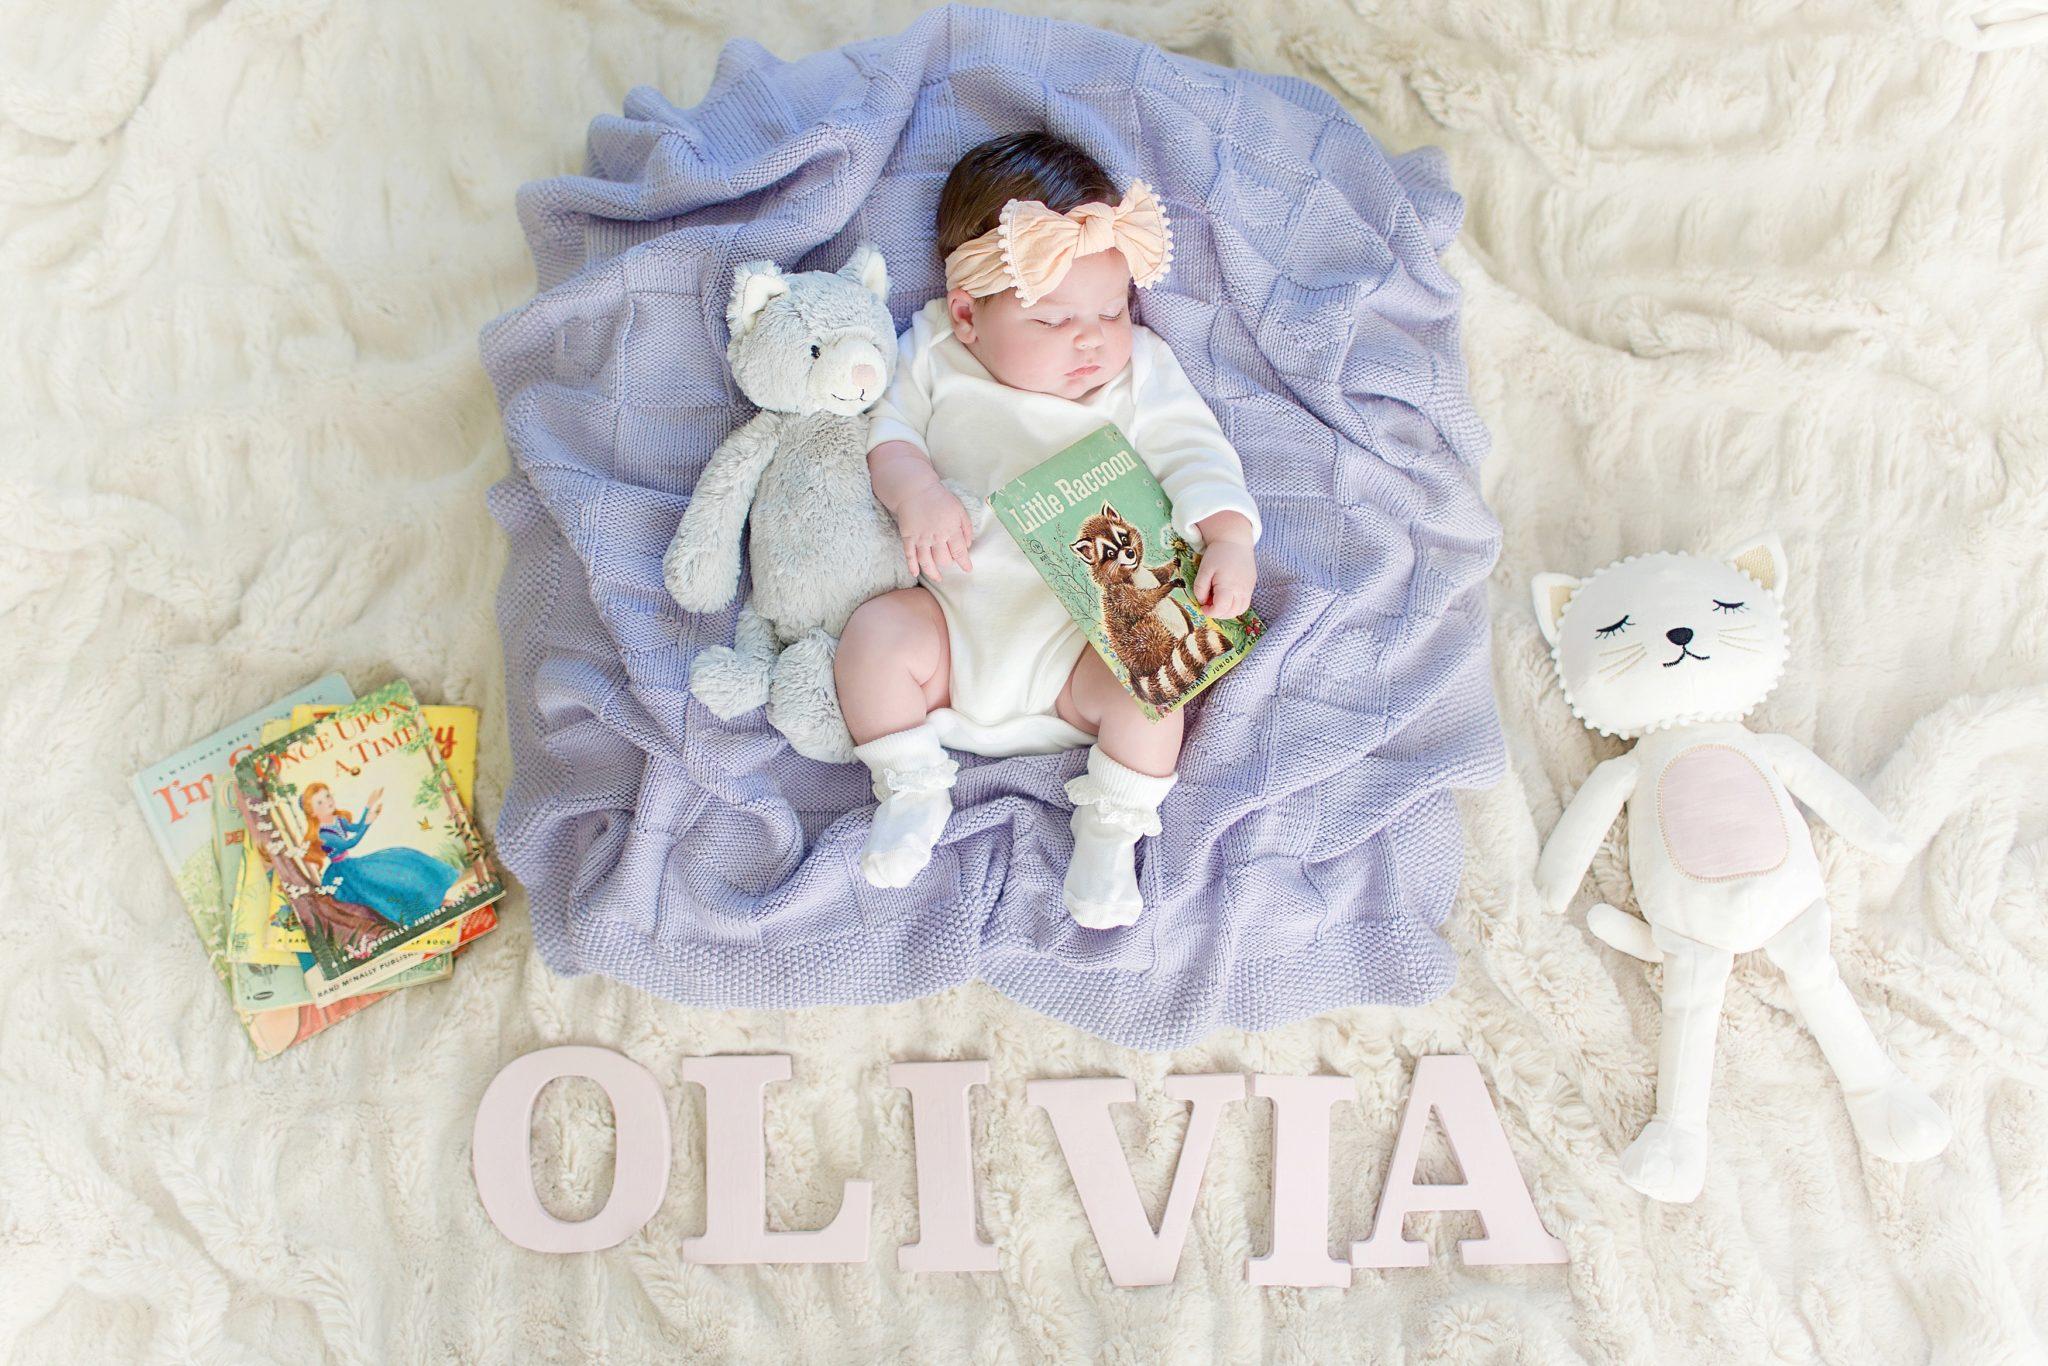 olivia_newborn_10